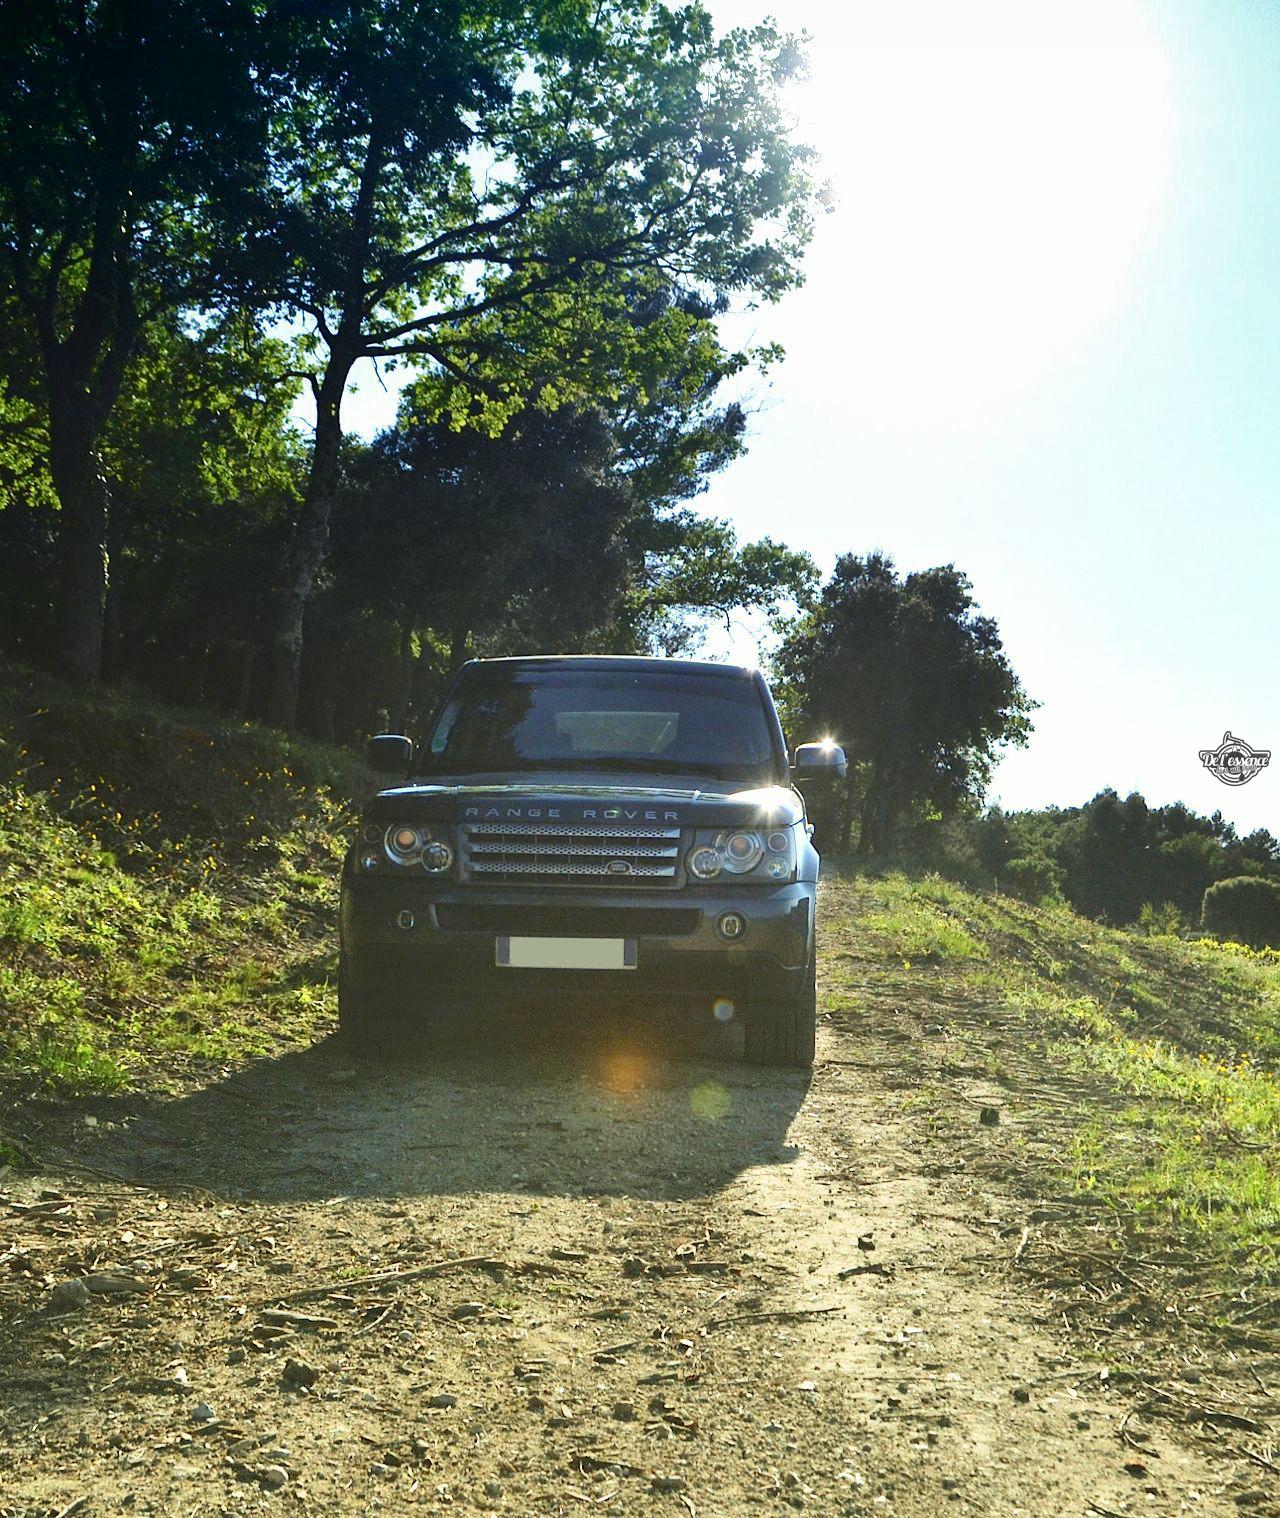 Range Rover Sport V8 Supercharged... Il est pas vert Hulk ?! 6